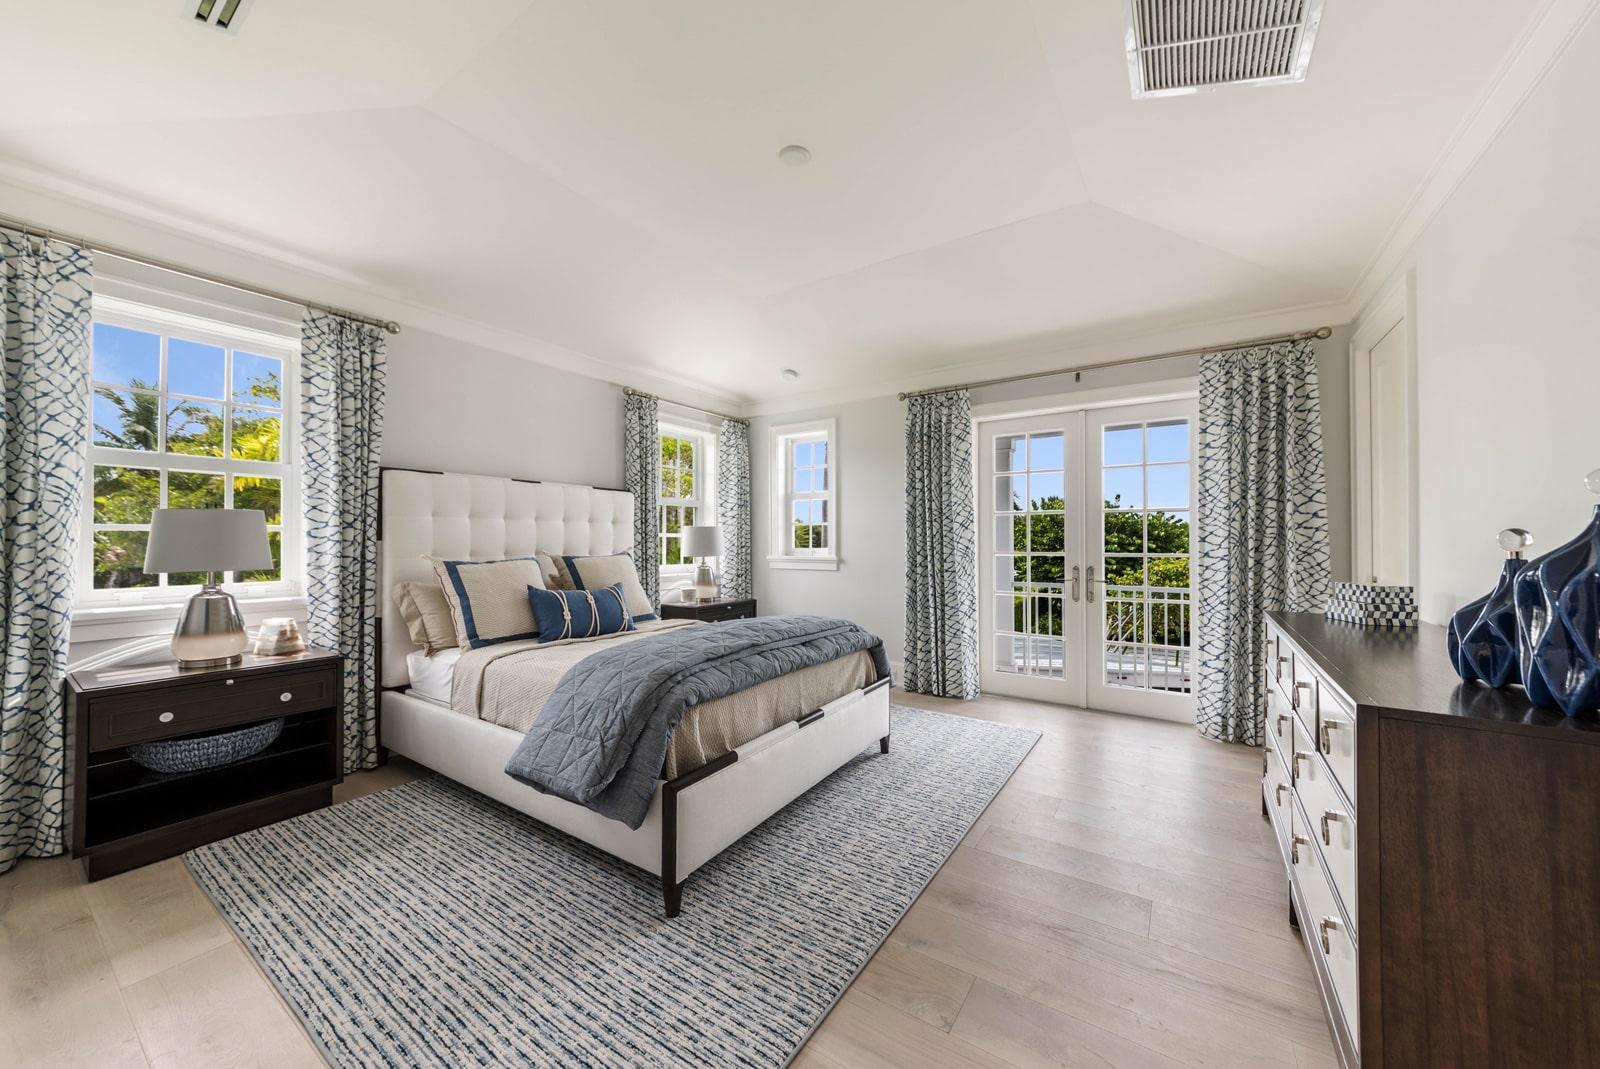 ecclestone-homes-bedroom-remodel-pg04-min